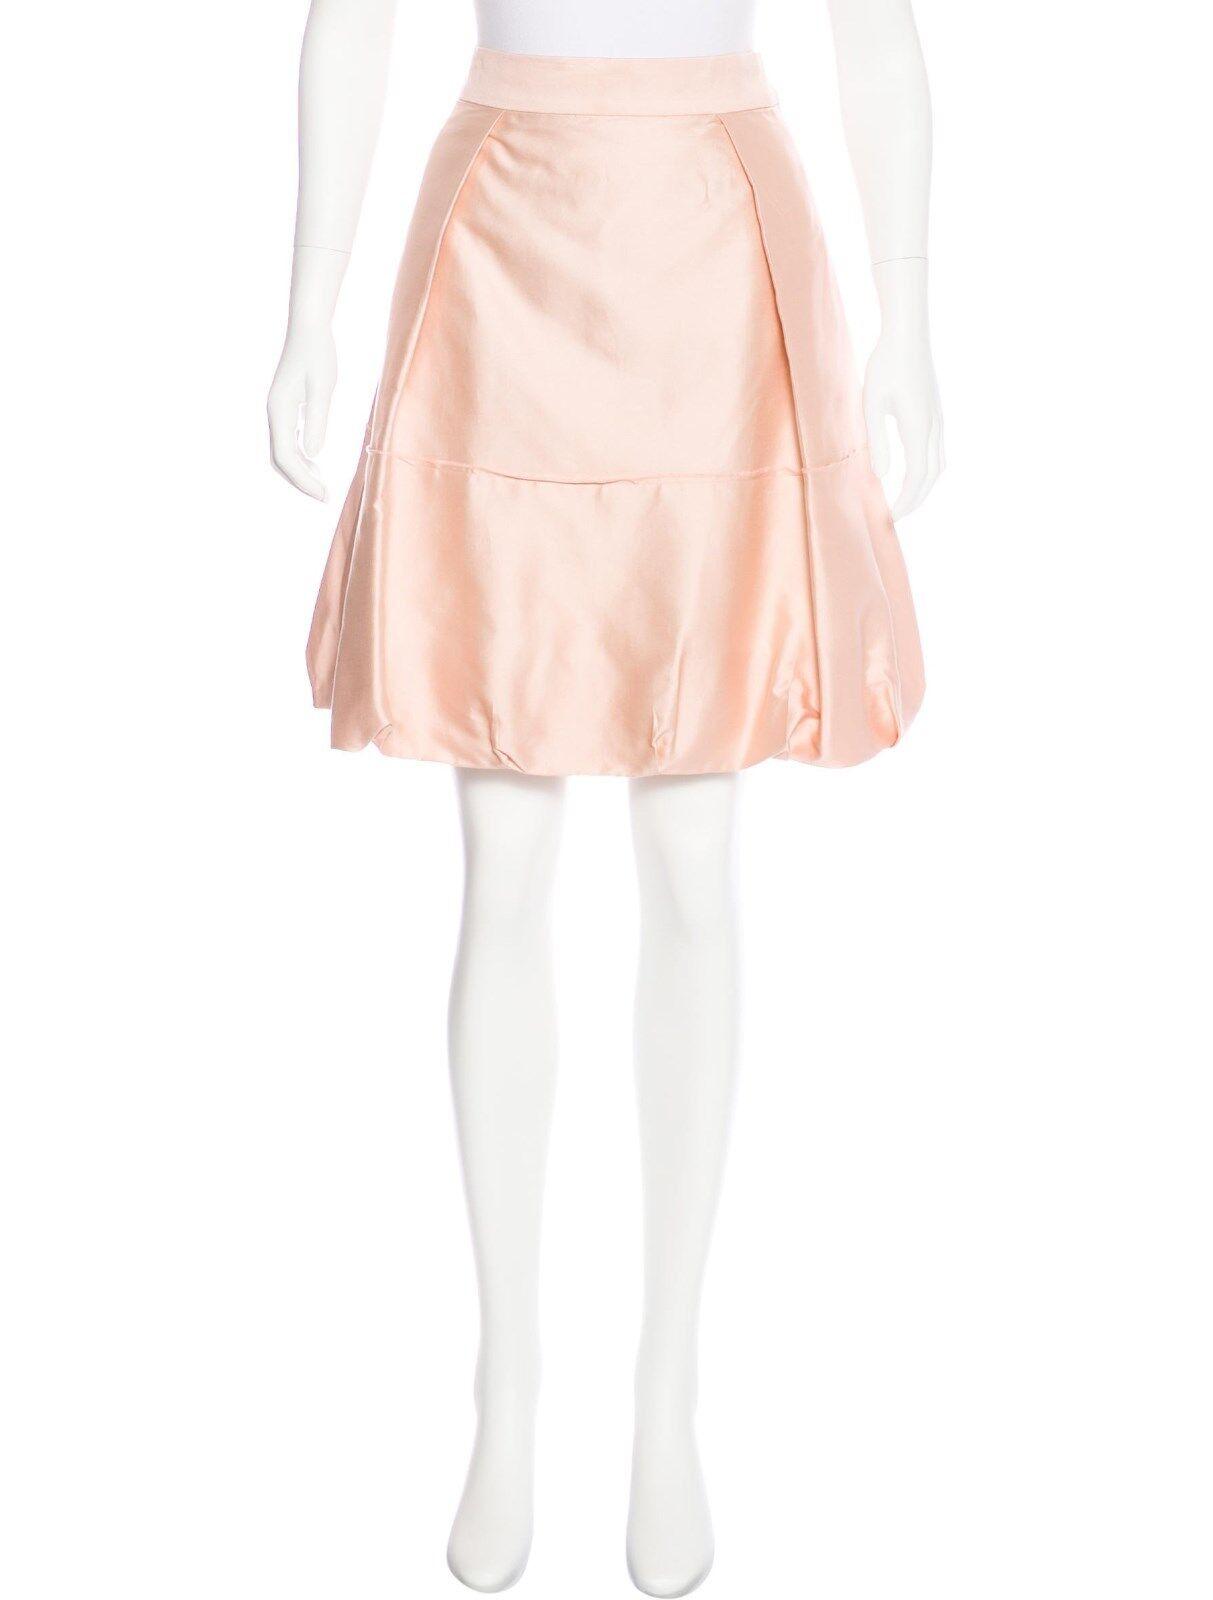 ANTHROPOLOGIE - LELA pink Tulip Satin A - Line Skirt Pink Sachet 10 M USED  489